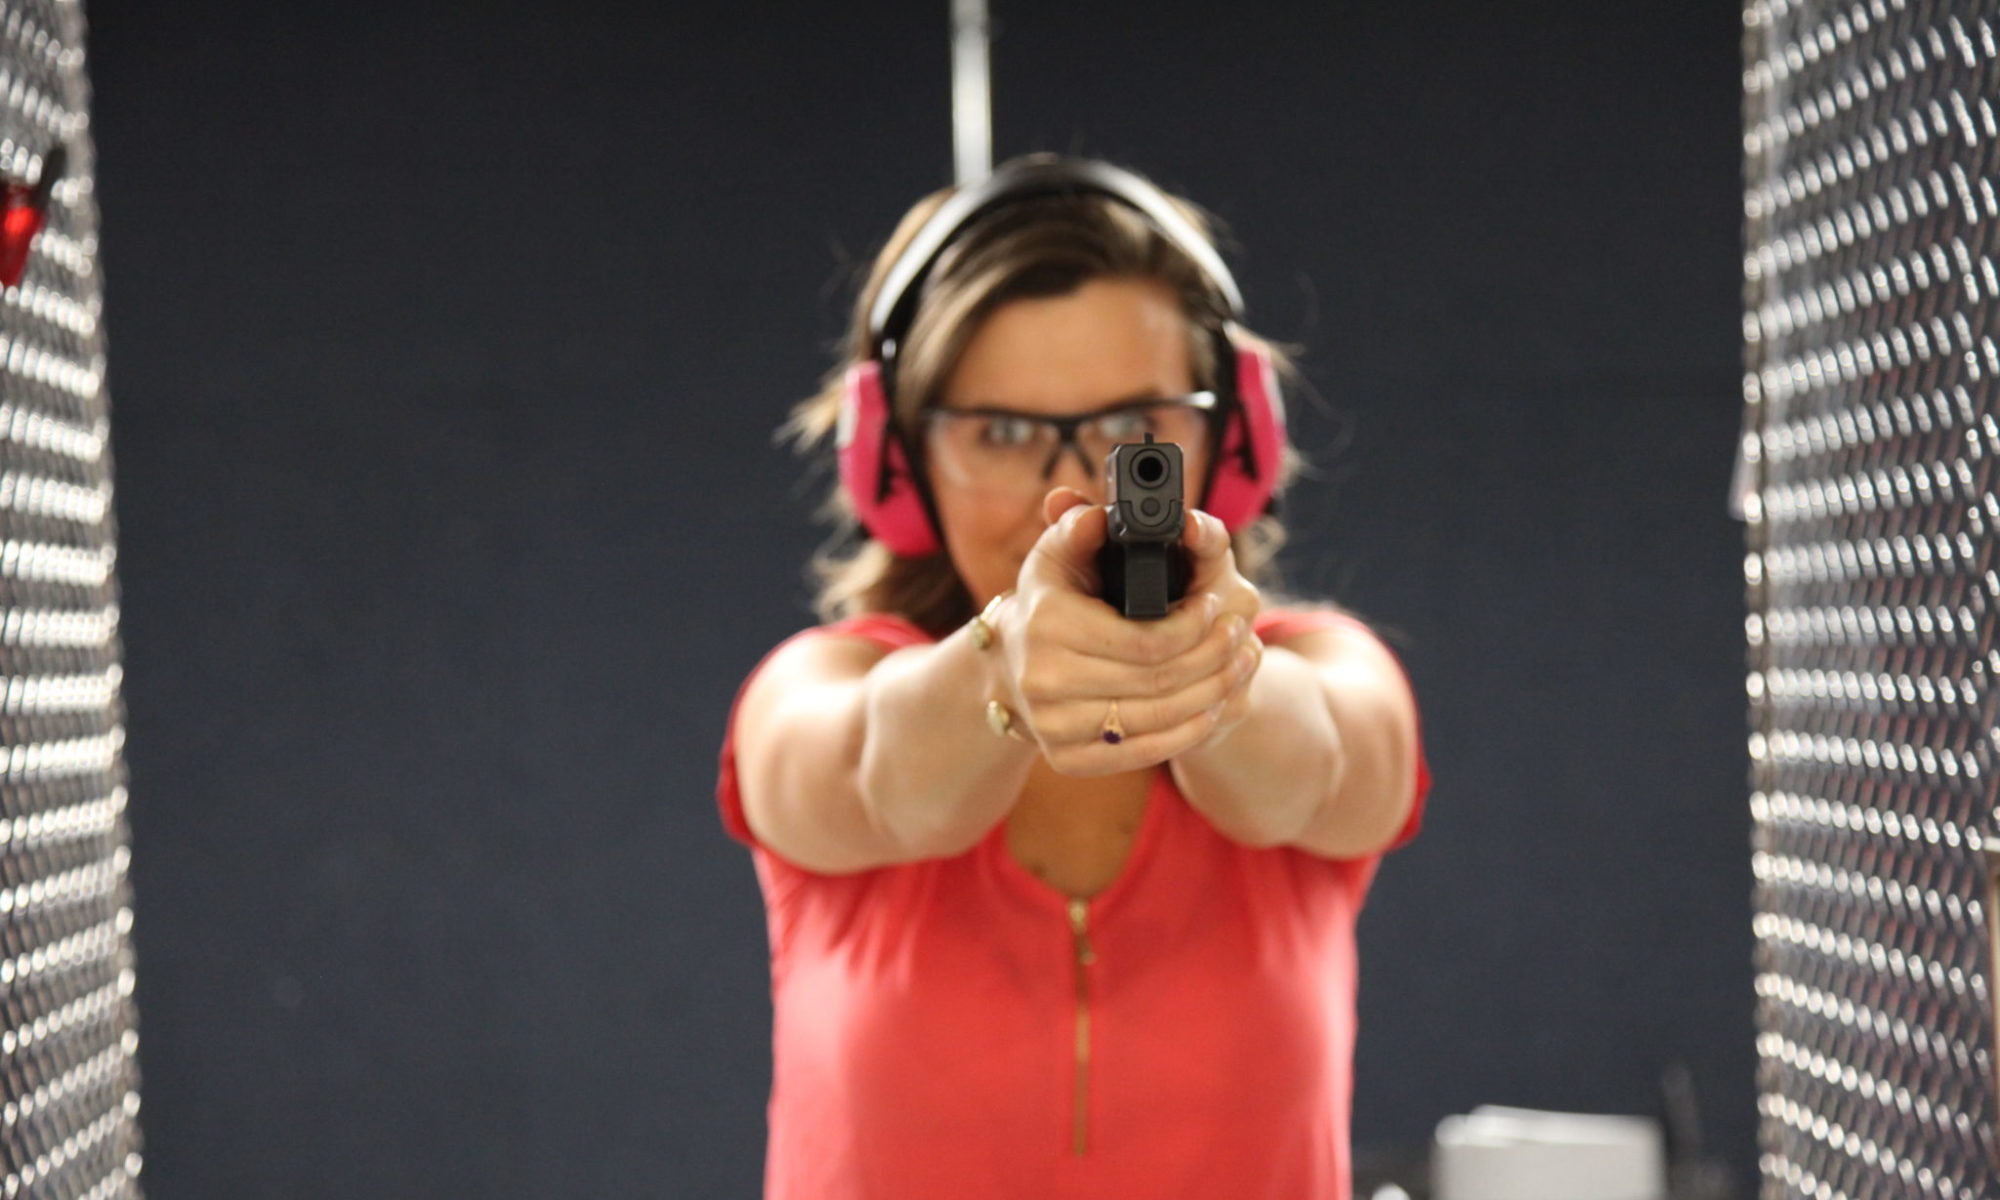 Asymmetric firearms training